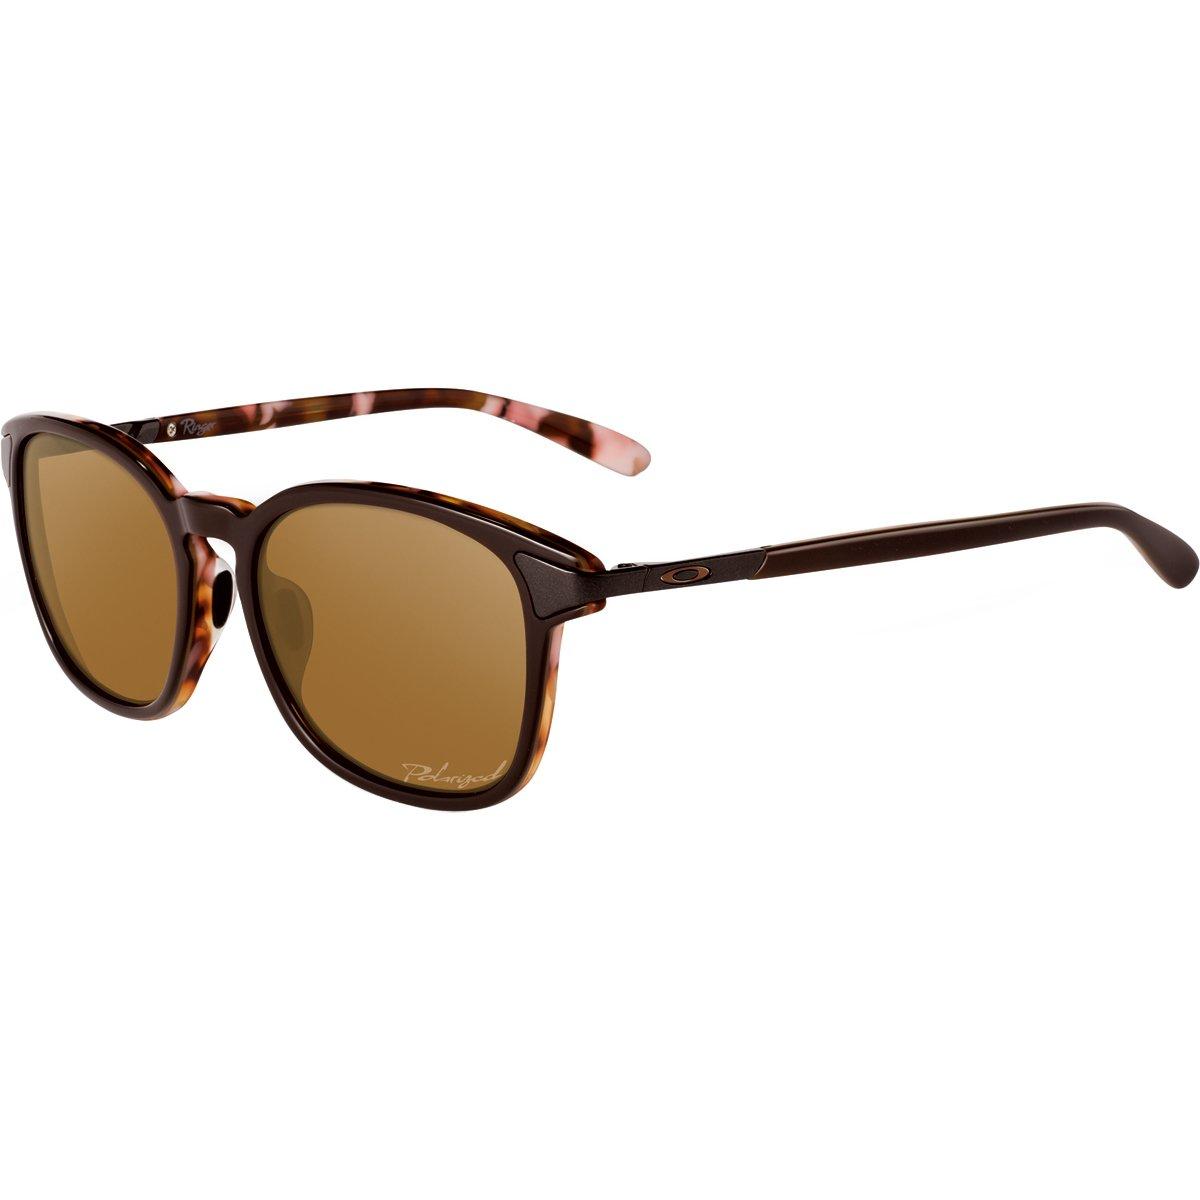 Oakley Women's OO2047 Ringer Round Sunglasses, Brown Mosaic/Bronze Polarized, 54 mm by Oakley